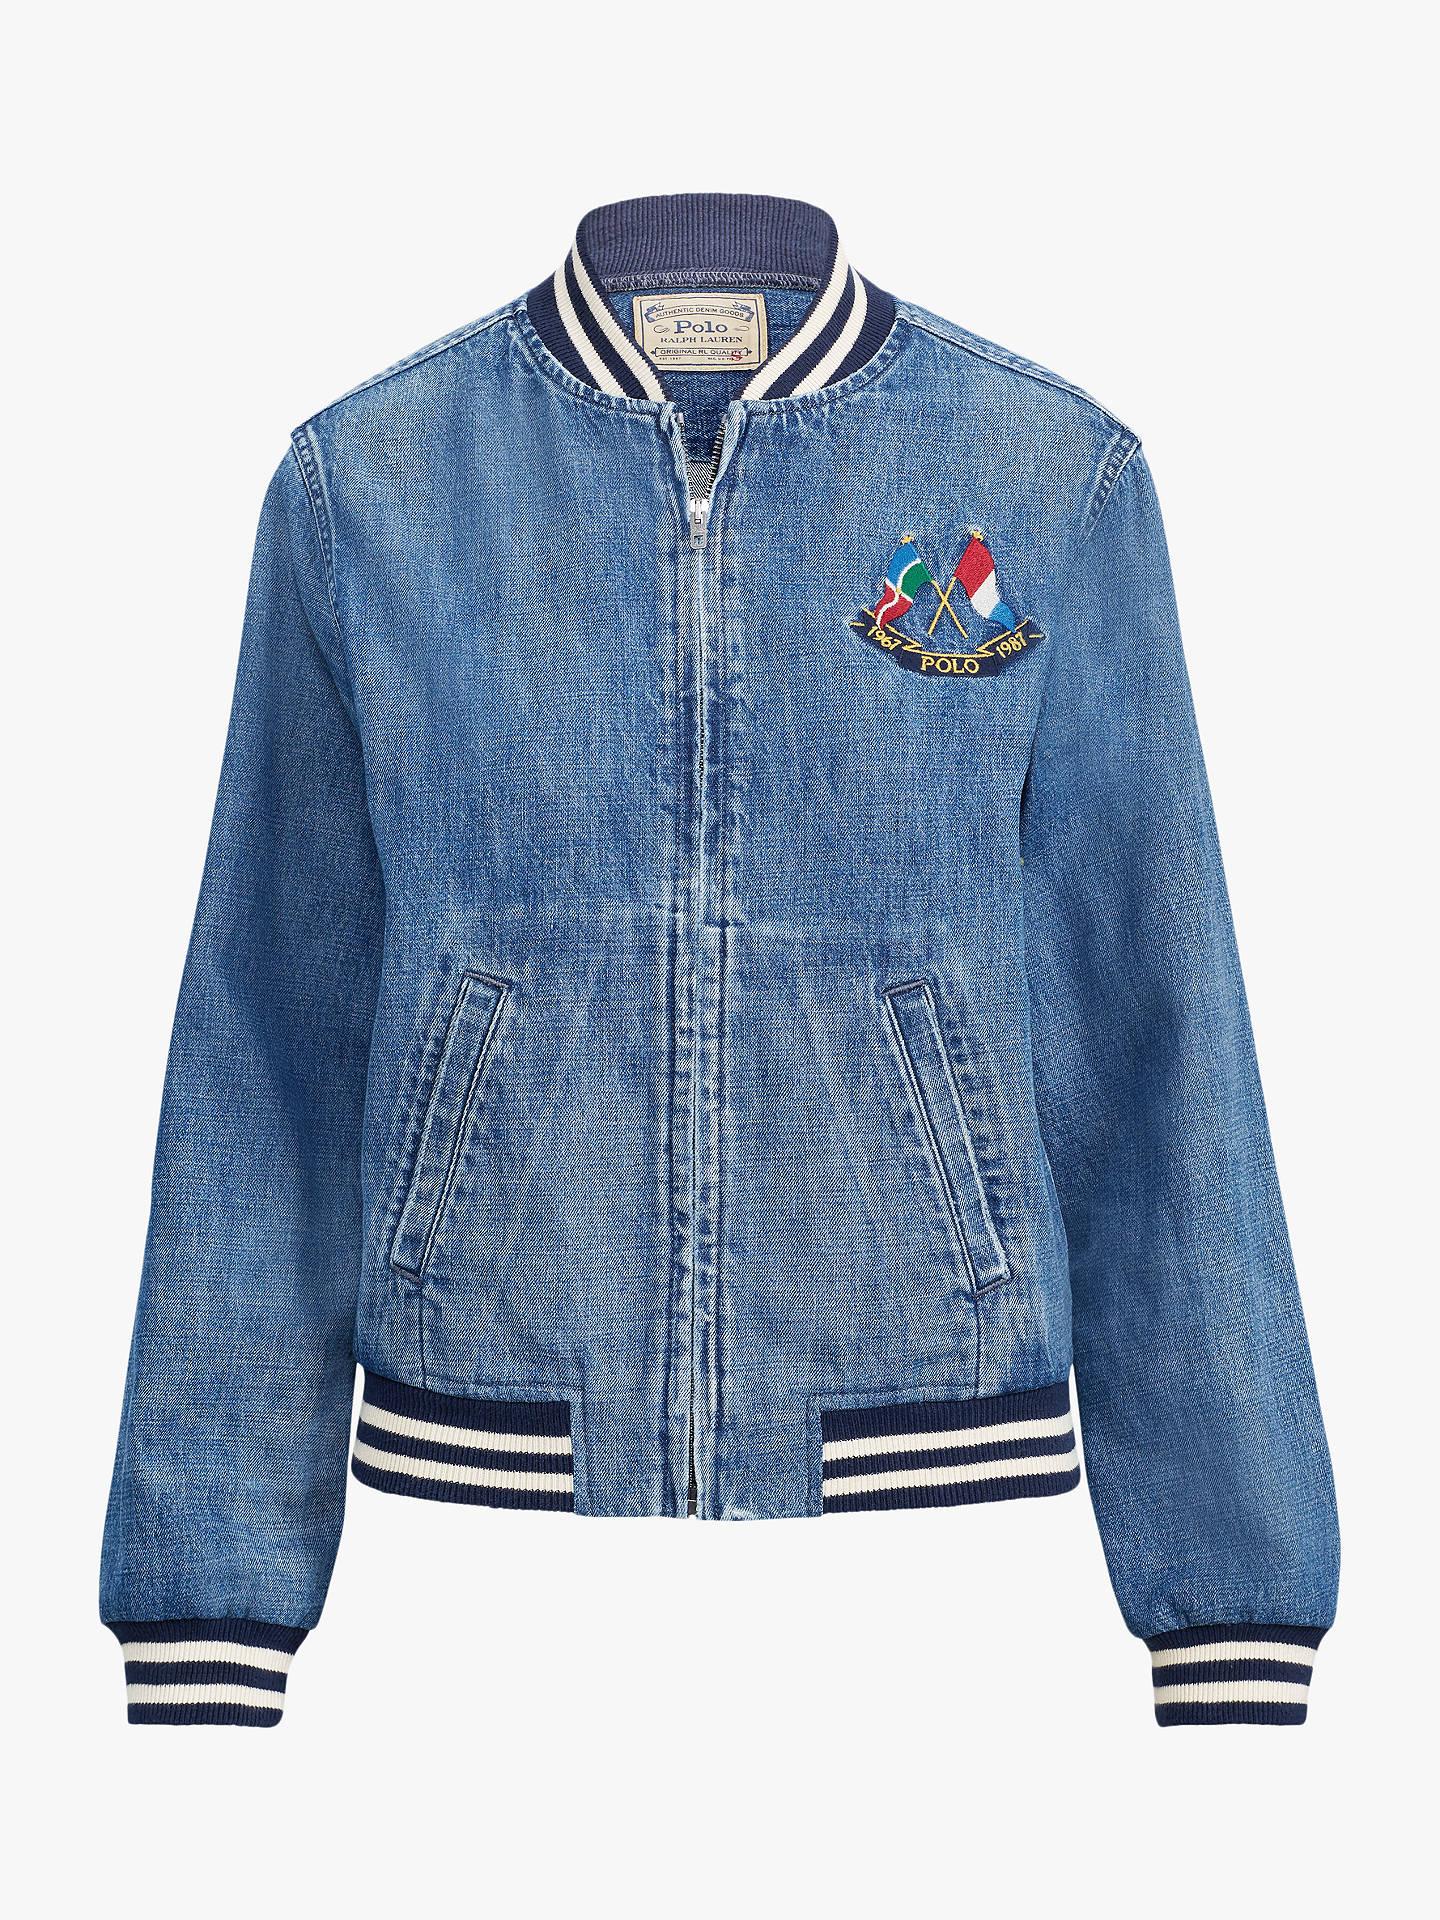 c49ea105d Polo Ralph Lauren Denim Bomber Varsity Jacket